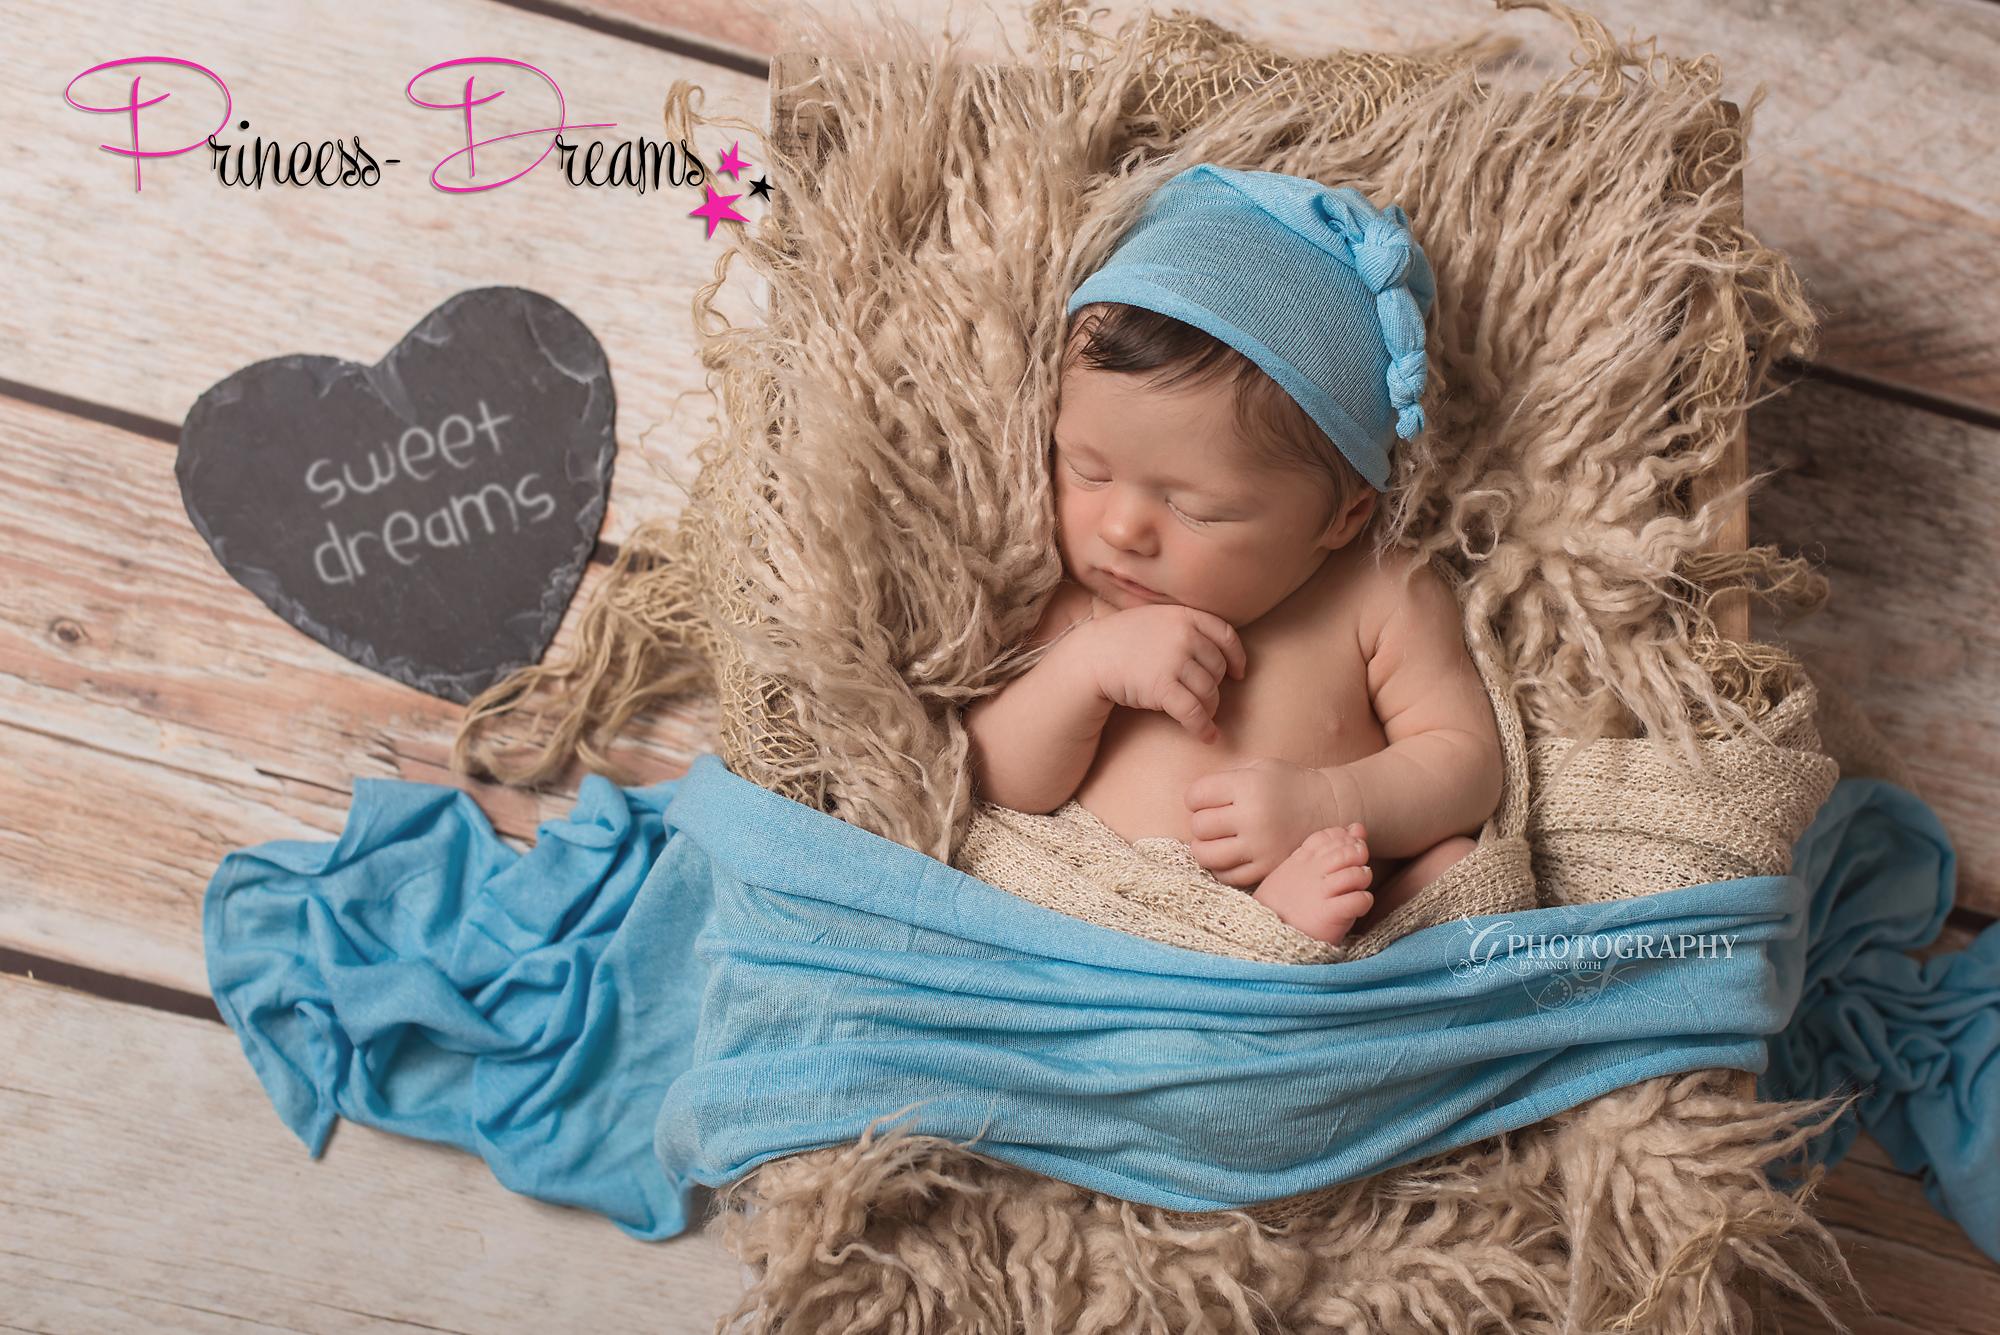 Neugeborenen Mütze, Newborn Mütze, Mütze Baby, Neugeborenen fotografie,baby shooting fotoshooting Fotoaccessoire baby Baby mütze